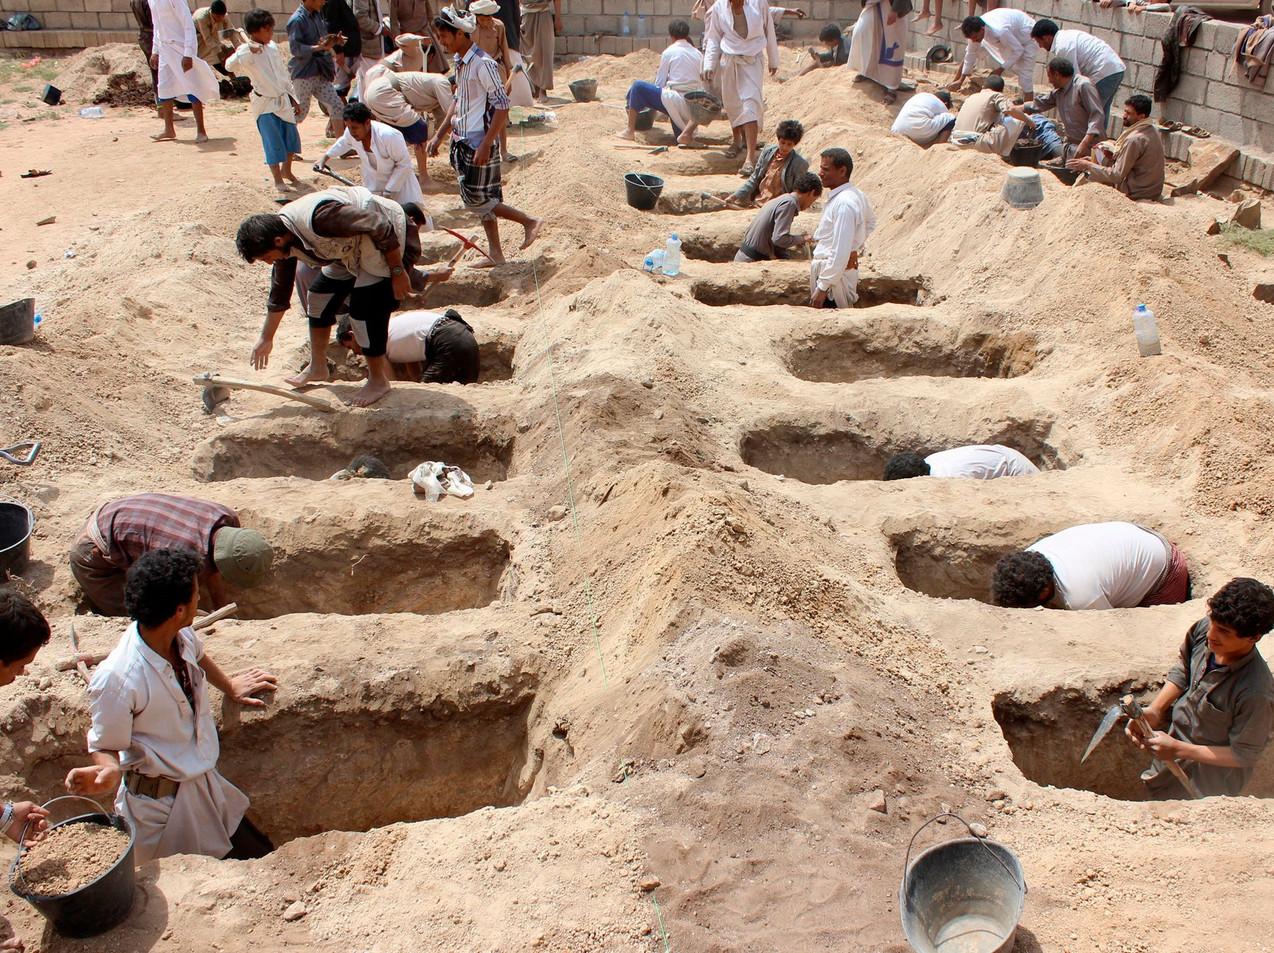 Yemenis digging graves